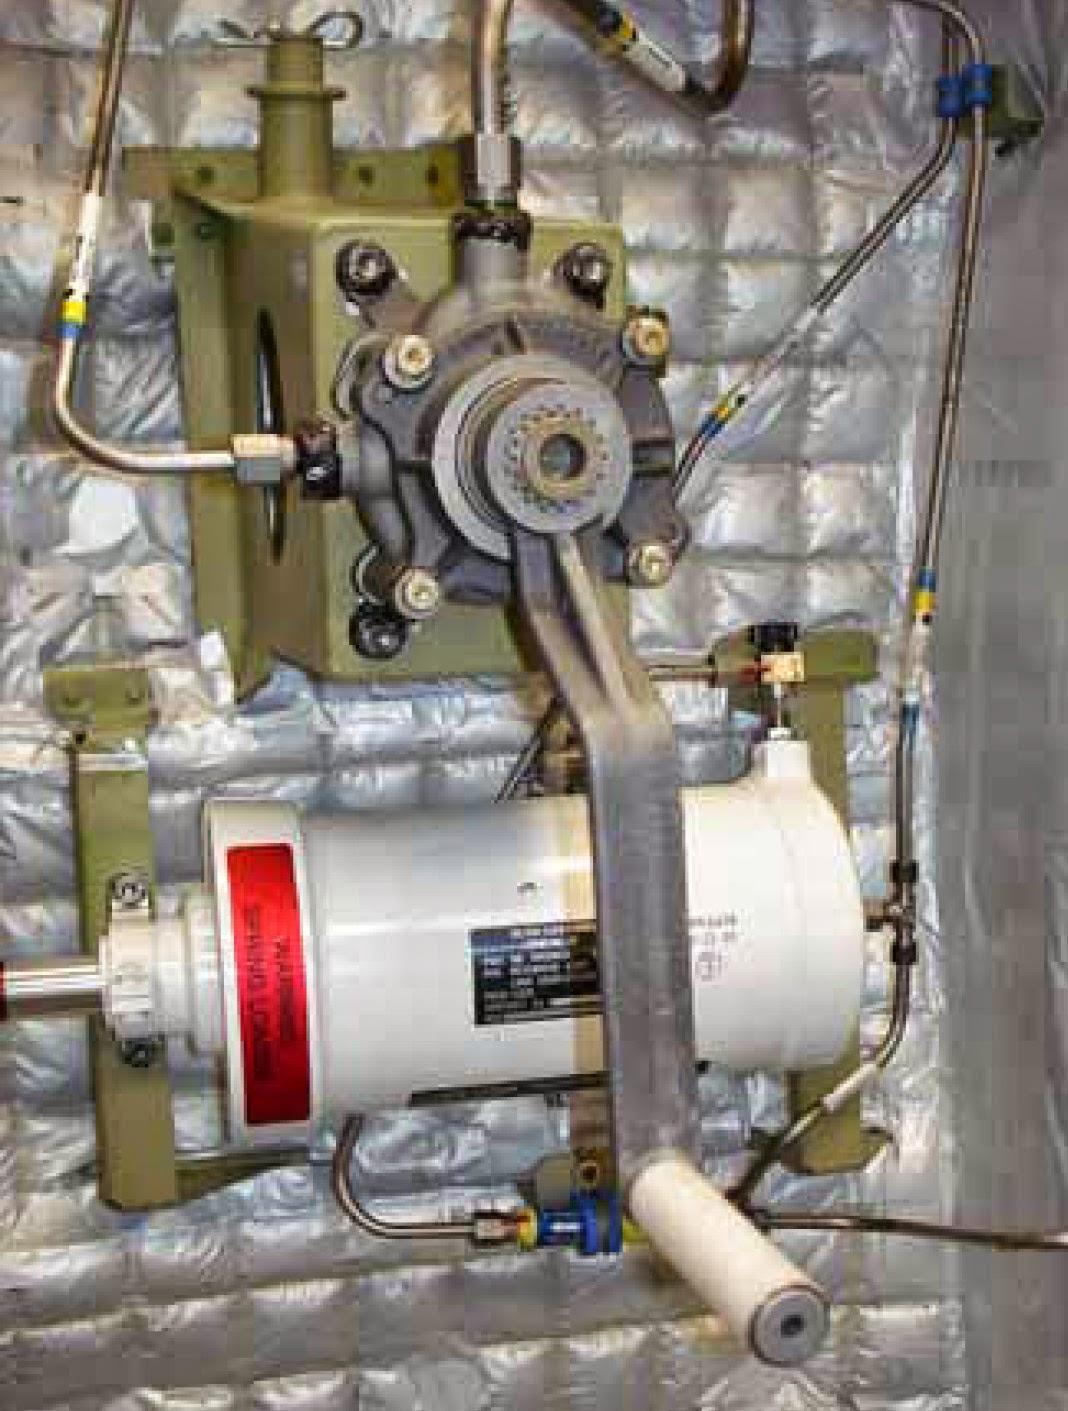 Rotary+hand+pump Aircraft Piston Engine Diagram on